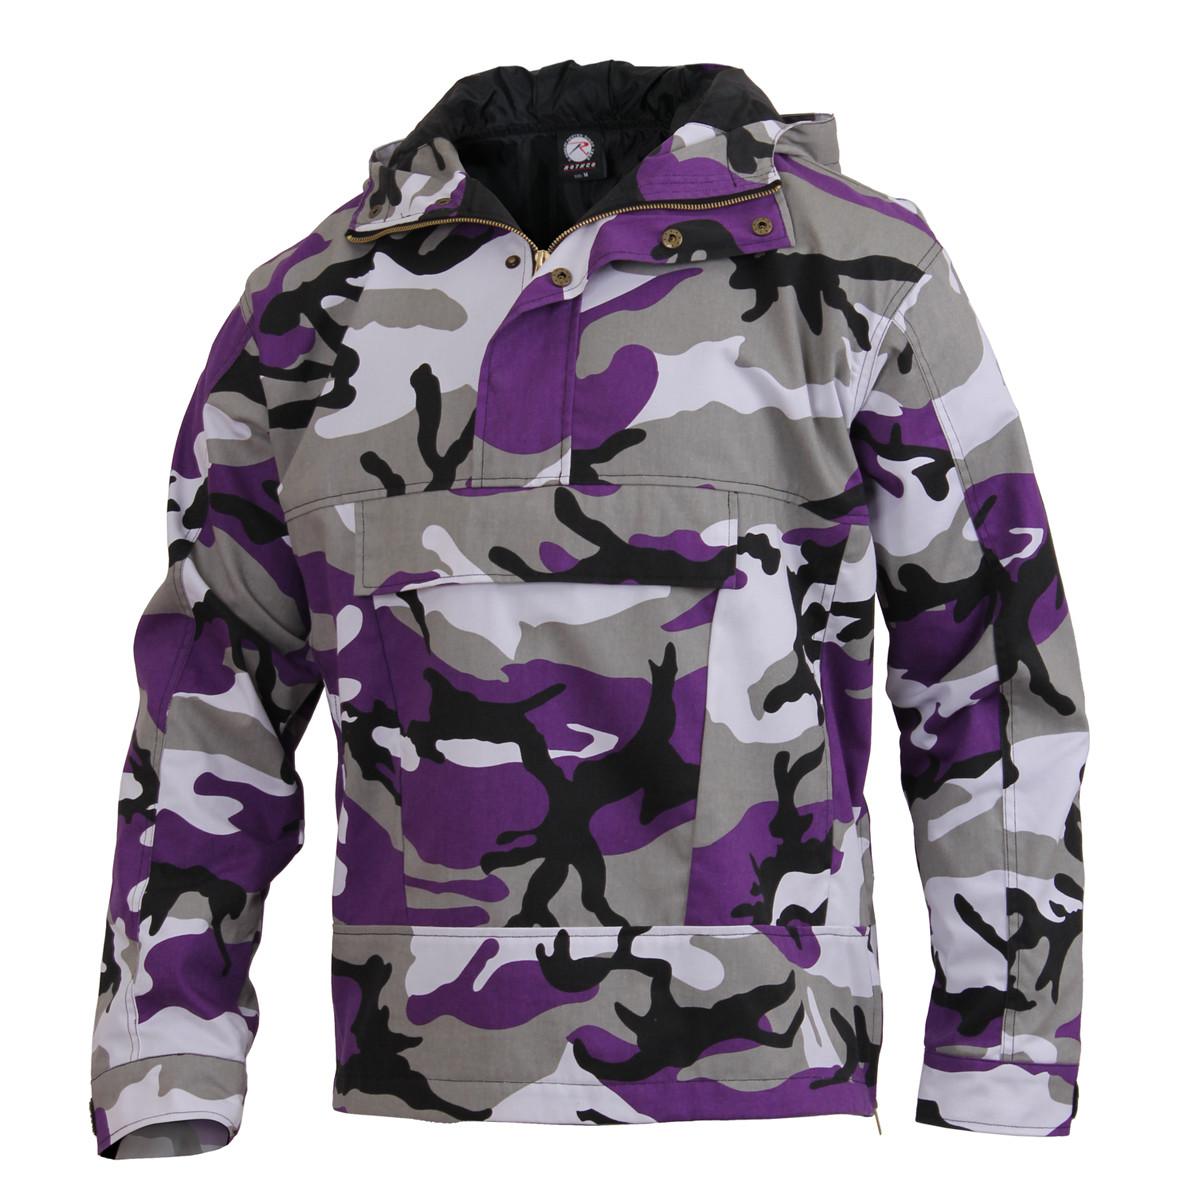 f176d2678b3f37 Shop Purple Camo Anorak Parkas - Fatigues Army Navy Gear